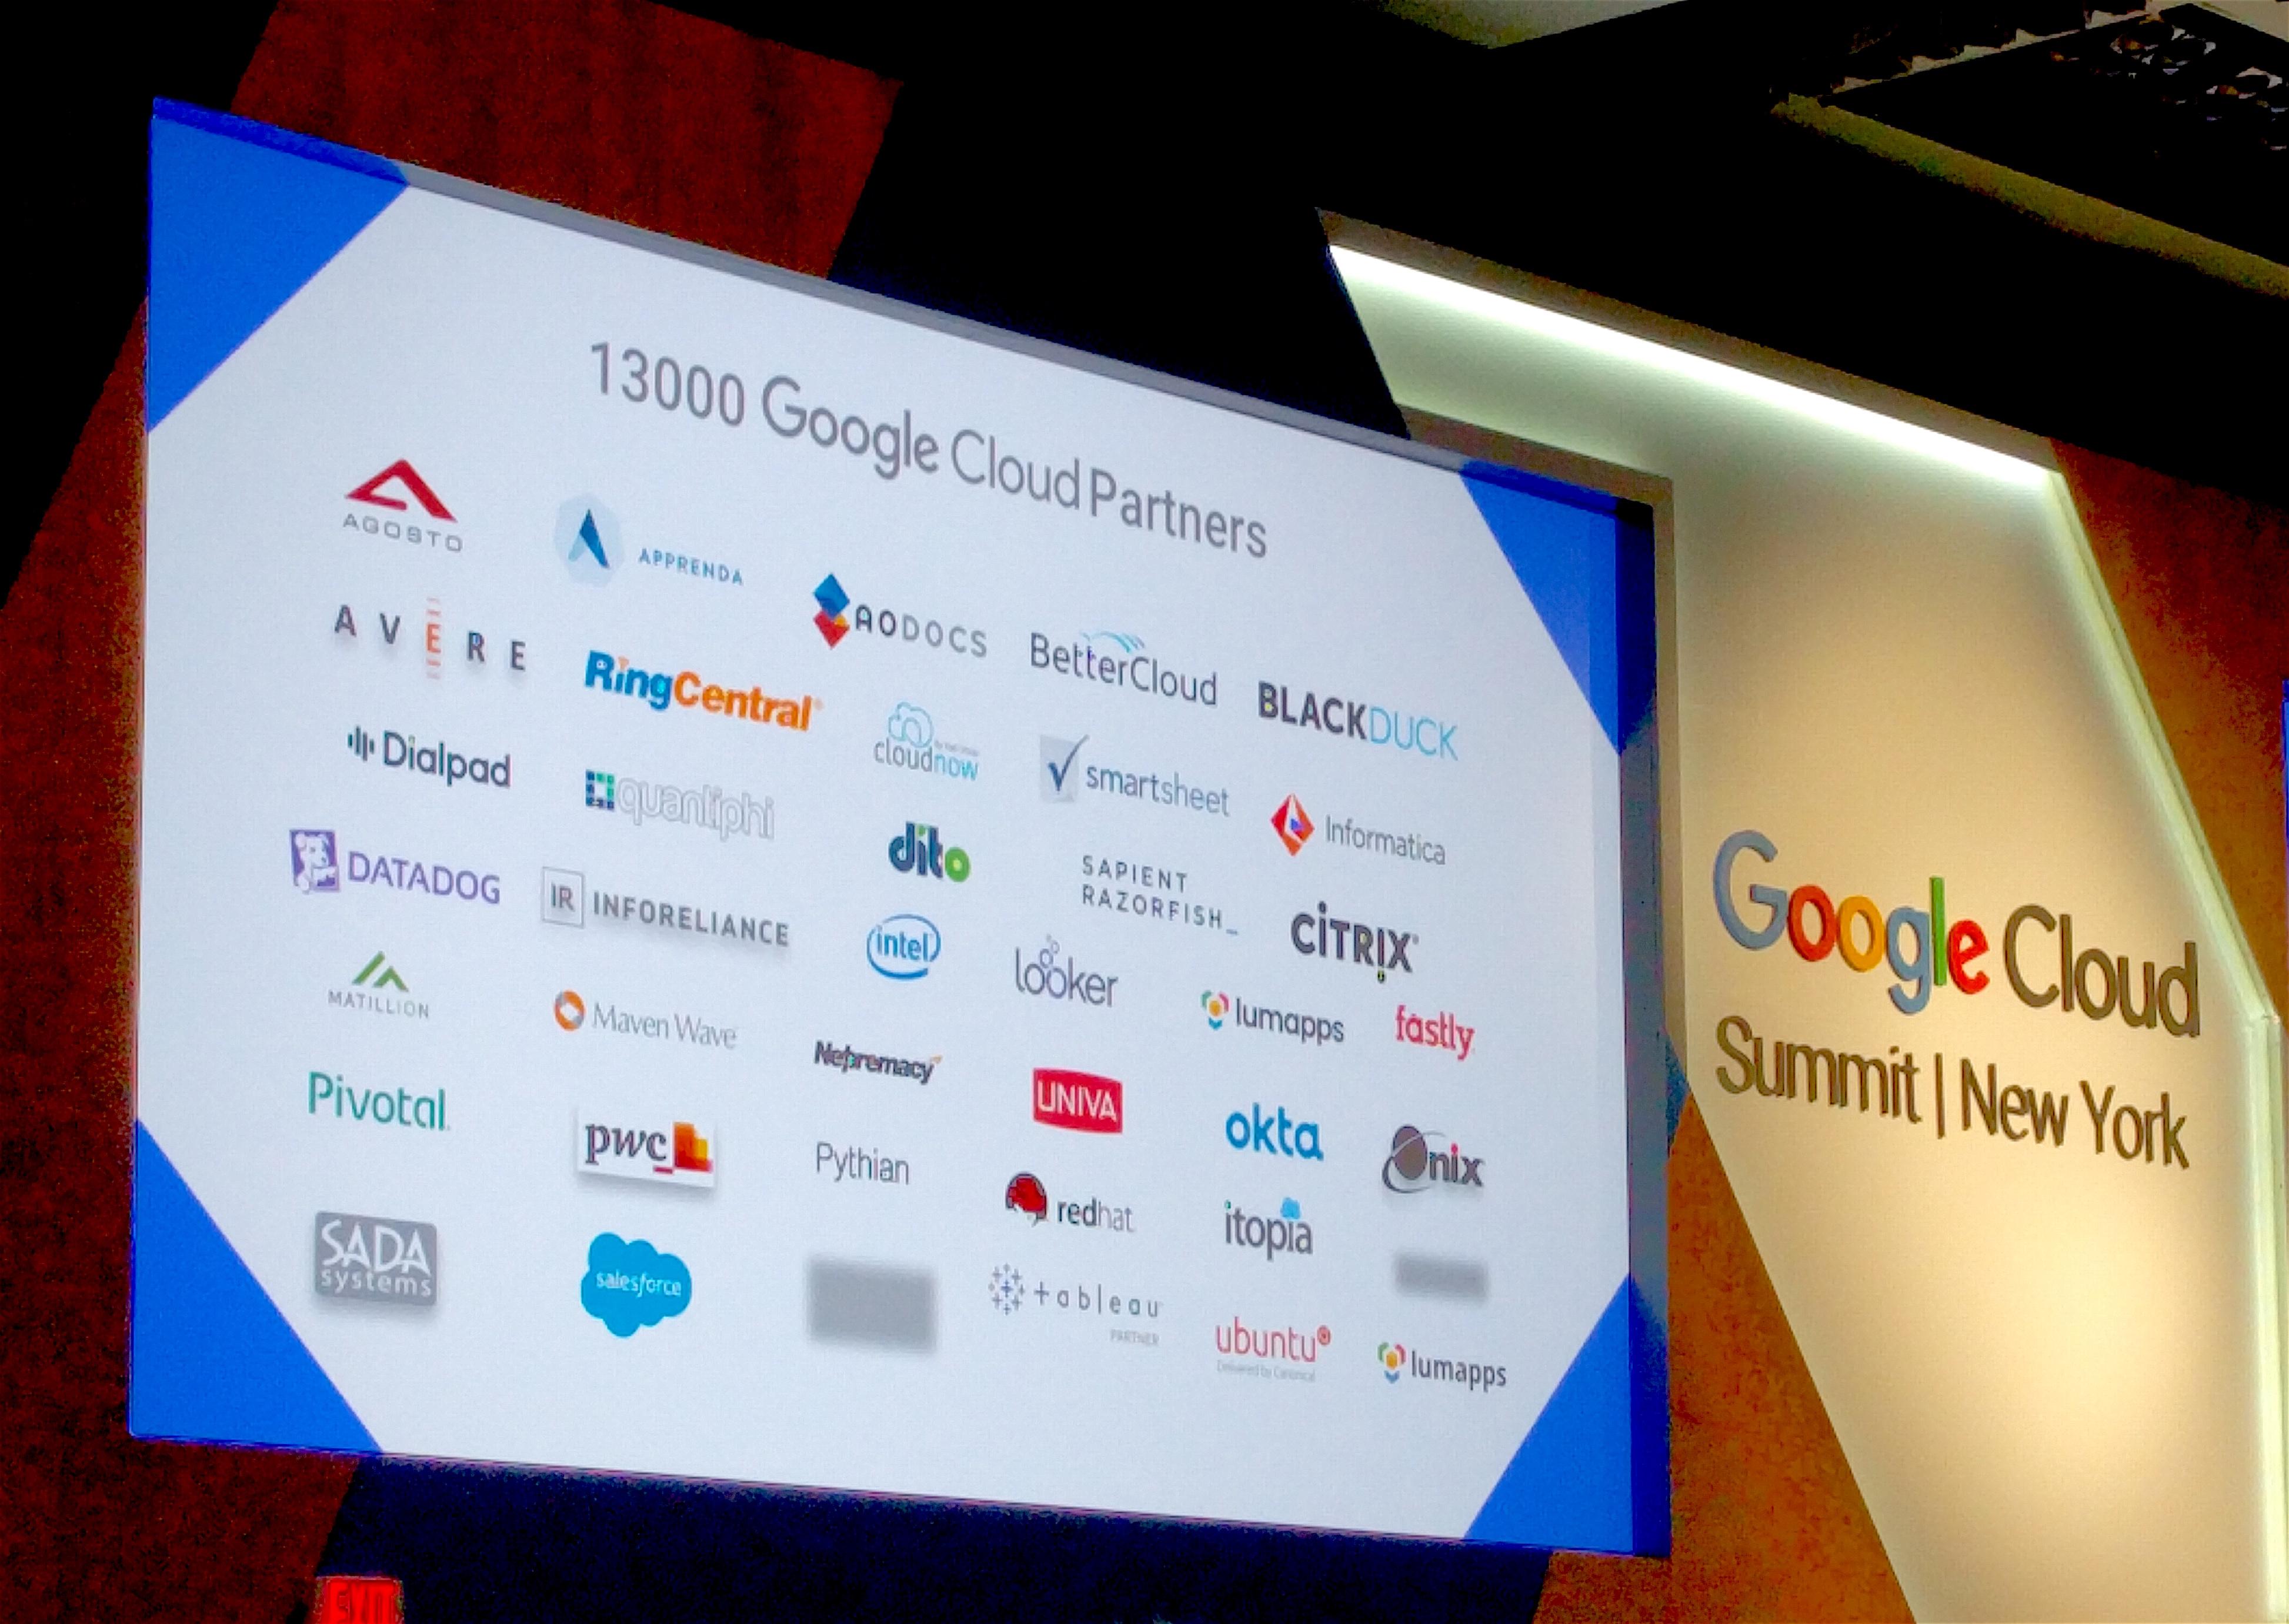 Google Cloud Partners board